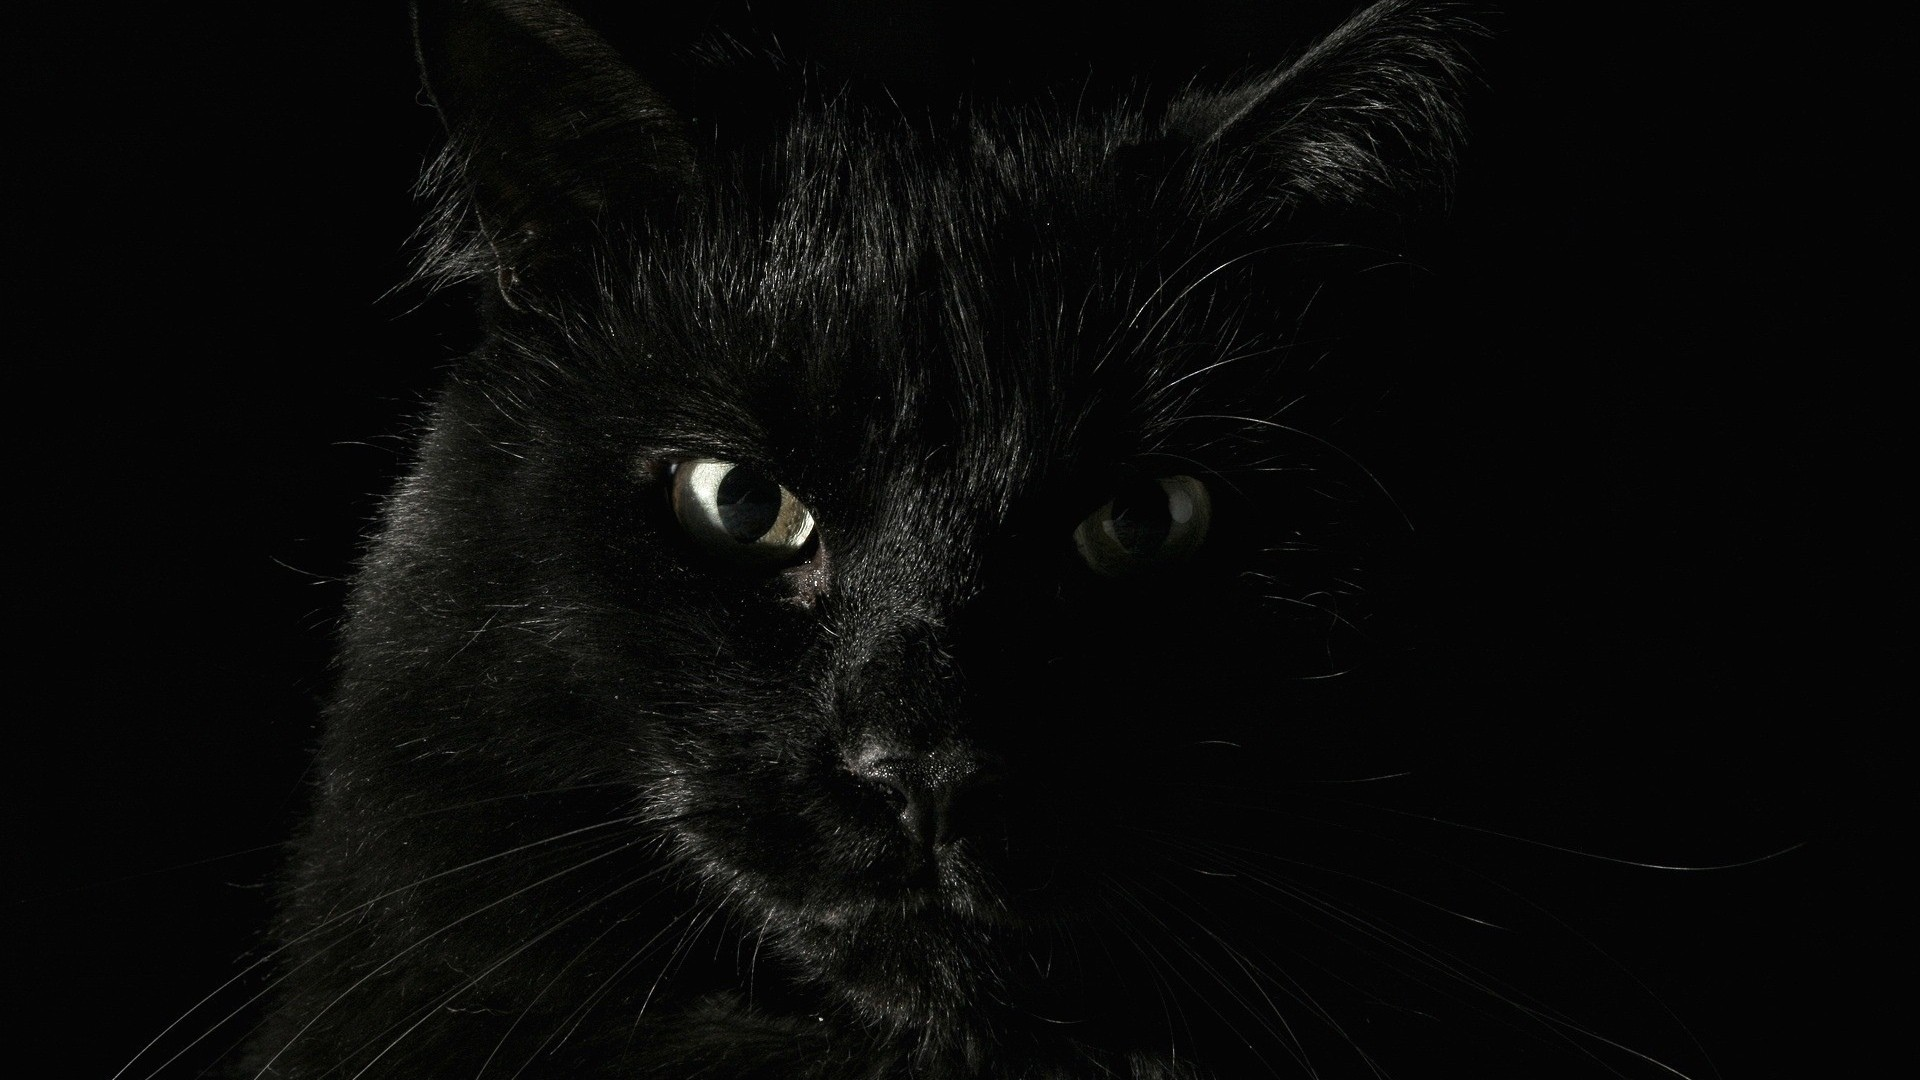 Black Cat PC Wallpaper